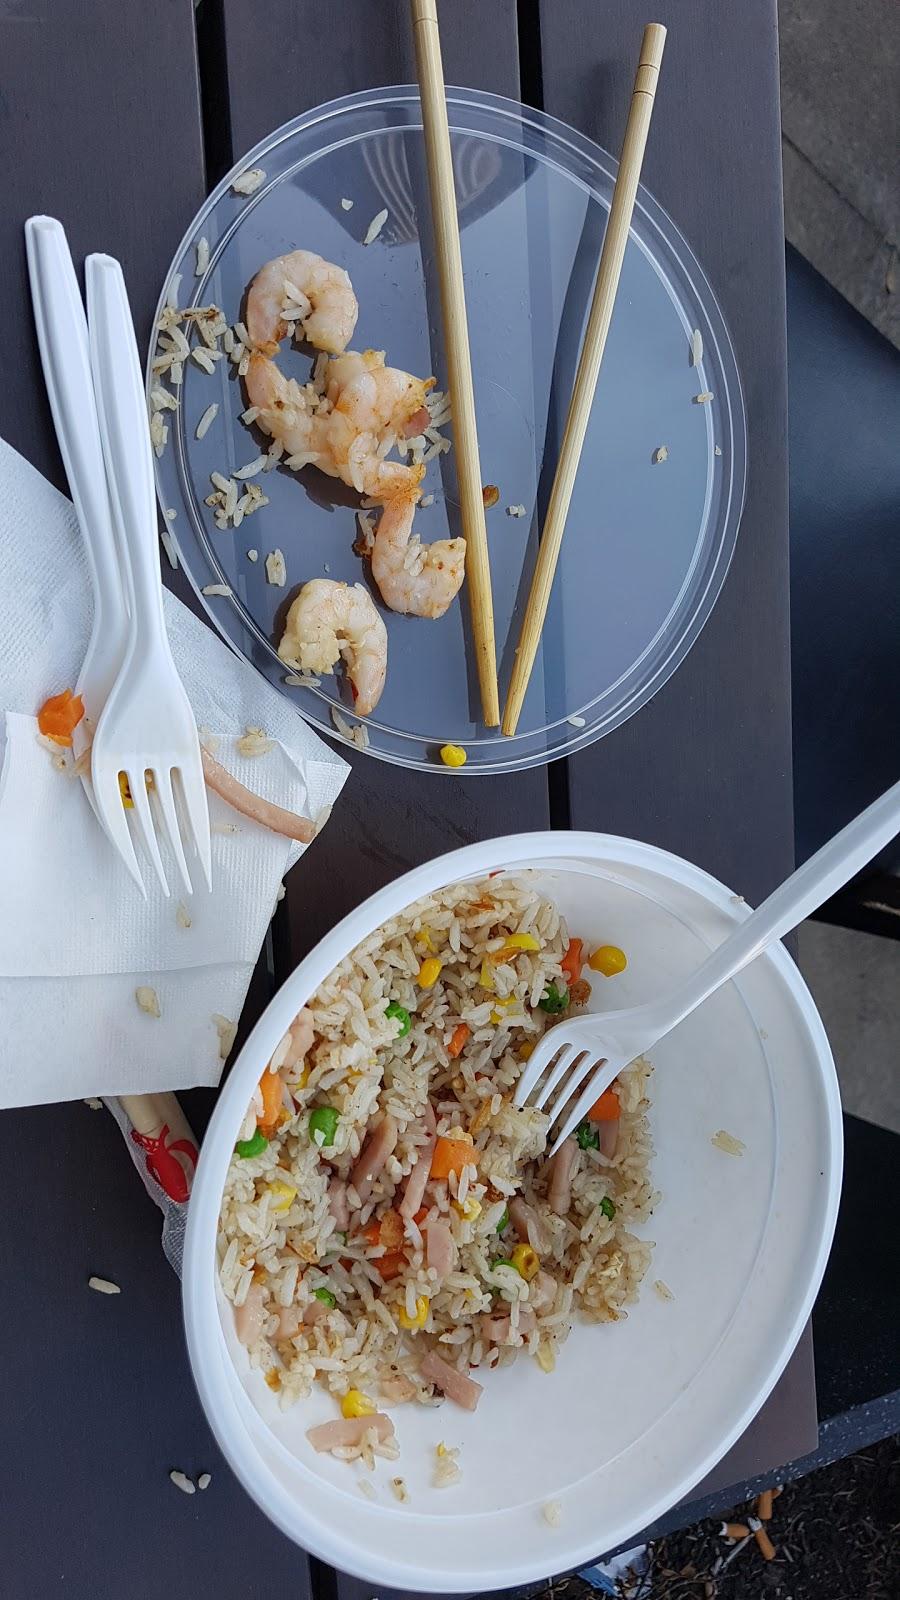 Asia Delight & Cafe | cafe | 7/227 Ballarat Rd, Braybrook VIC 3019, Australia | 0393170259 OR +61 3 9317 0259